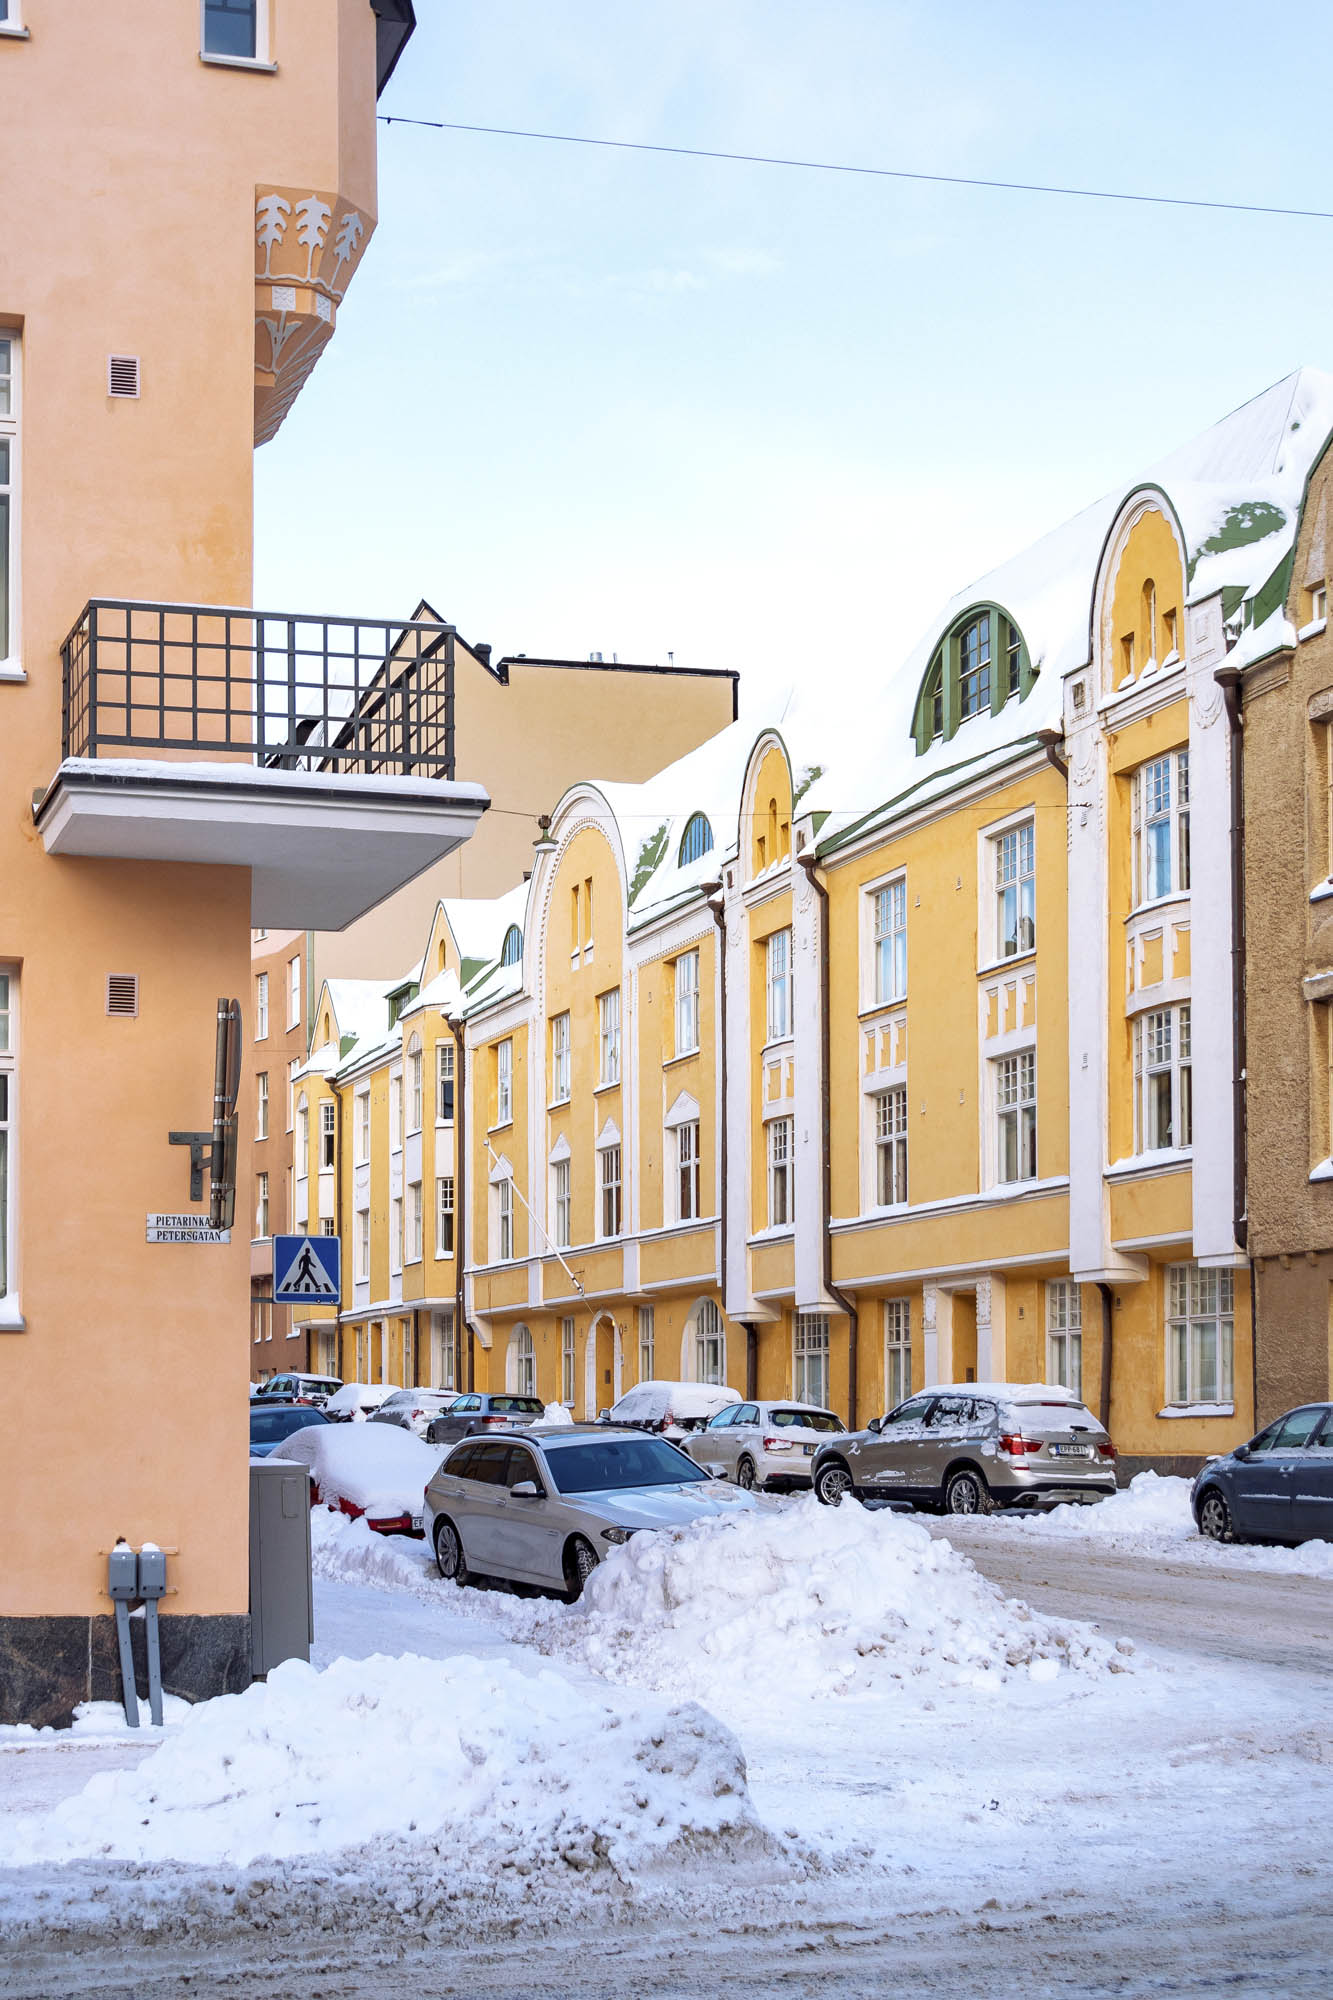 Huvilakatu Street / Ullanlinna District